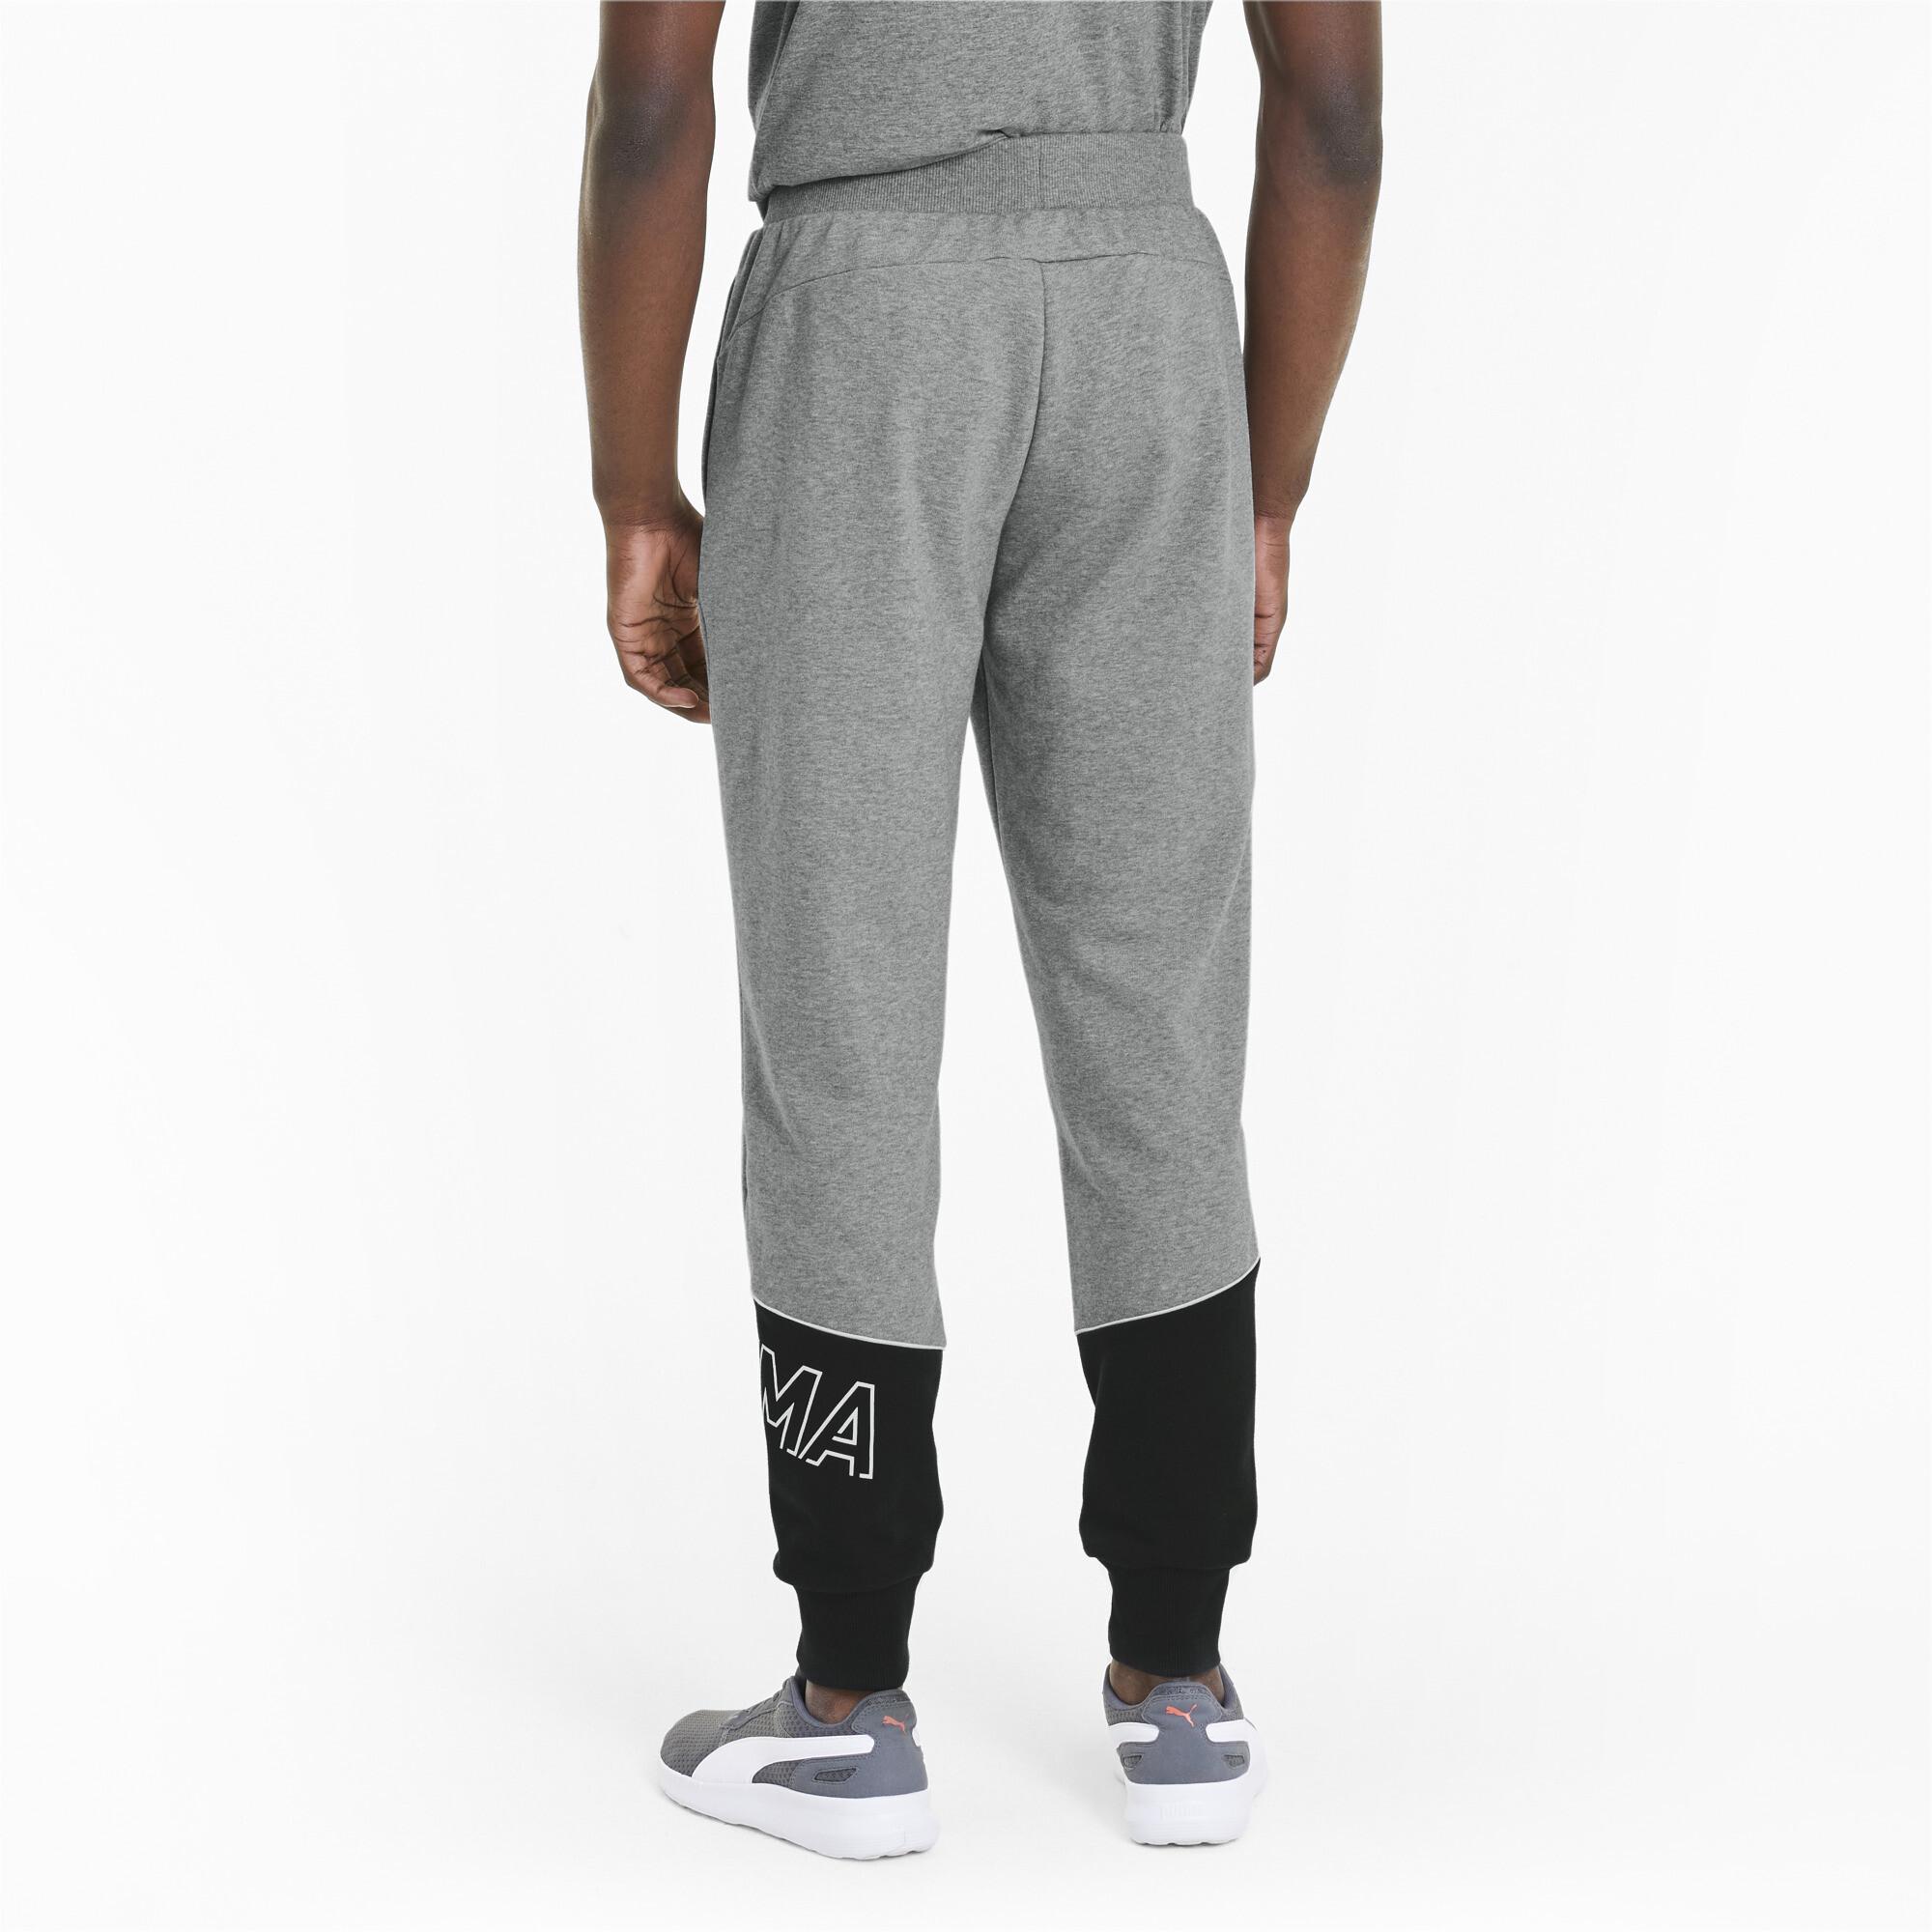 PUMA-Men-039-s-Modern-Sports-Sweatpants thumbnail 5